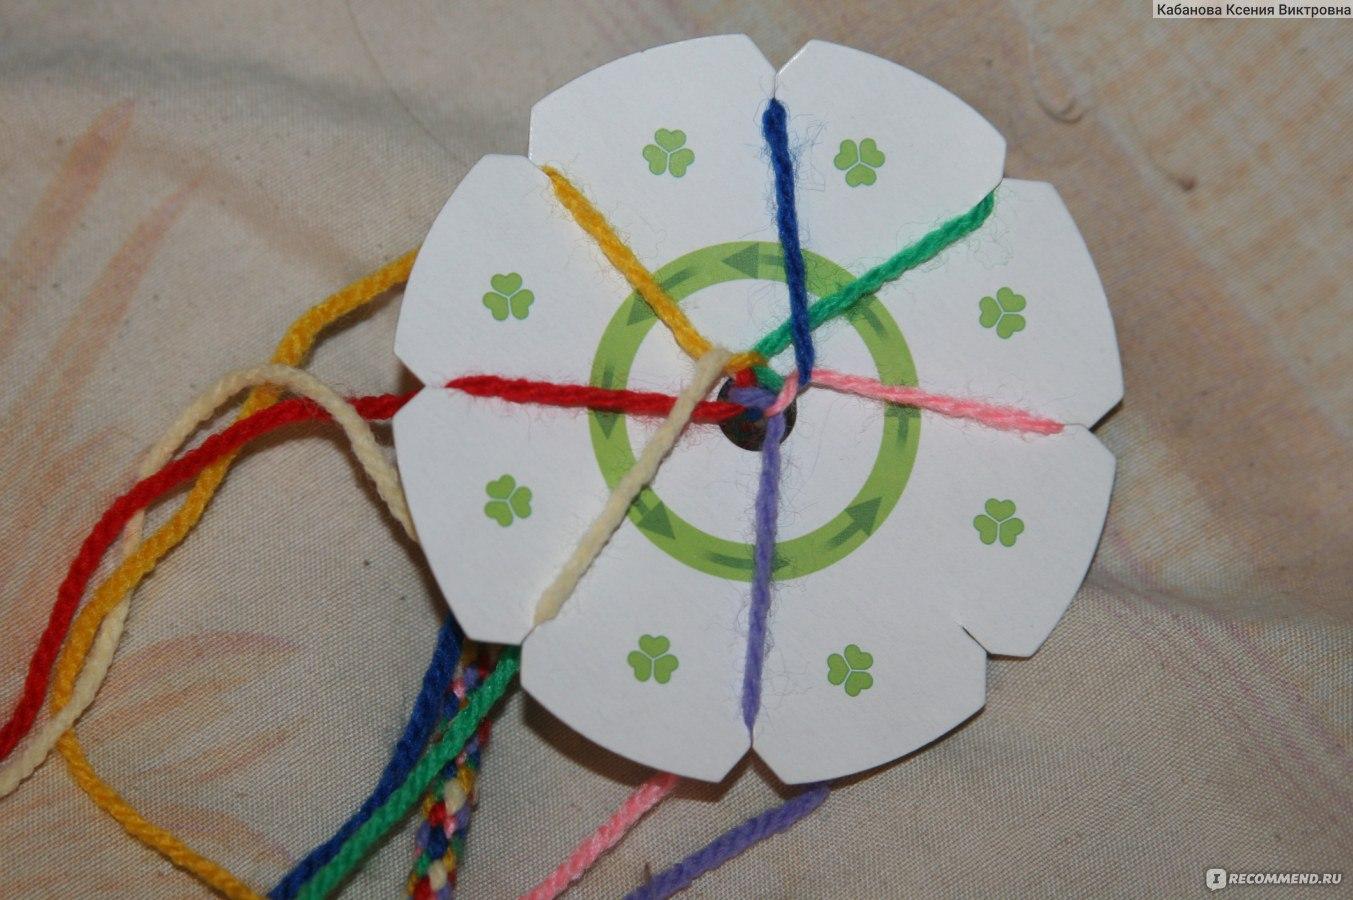 фенечки схема стрелкой